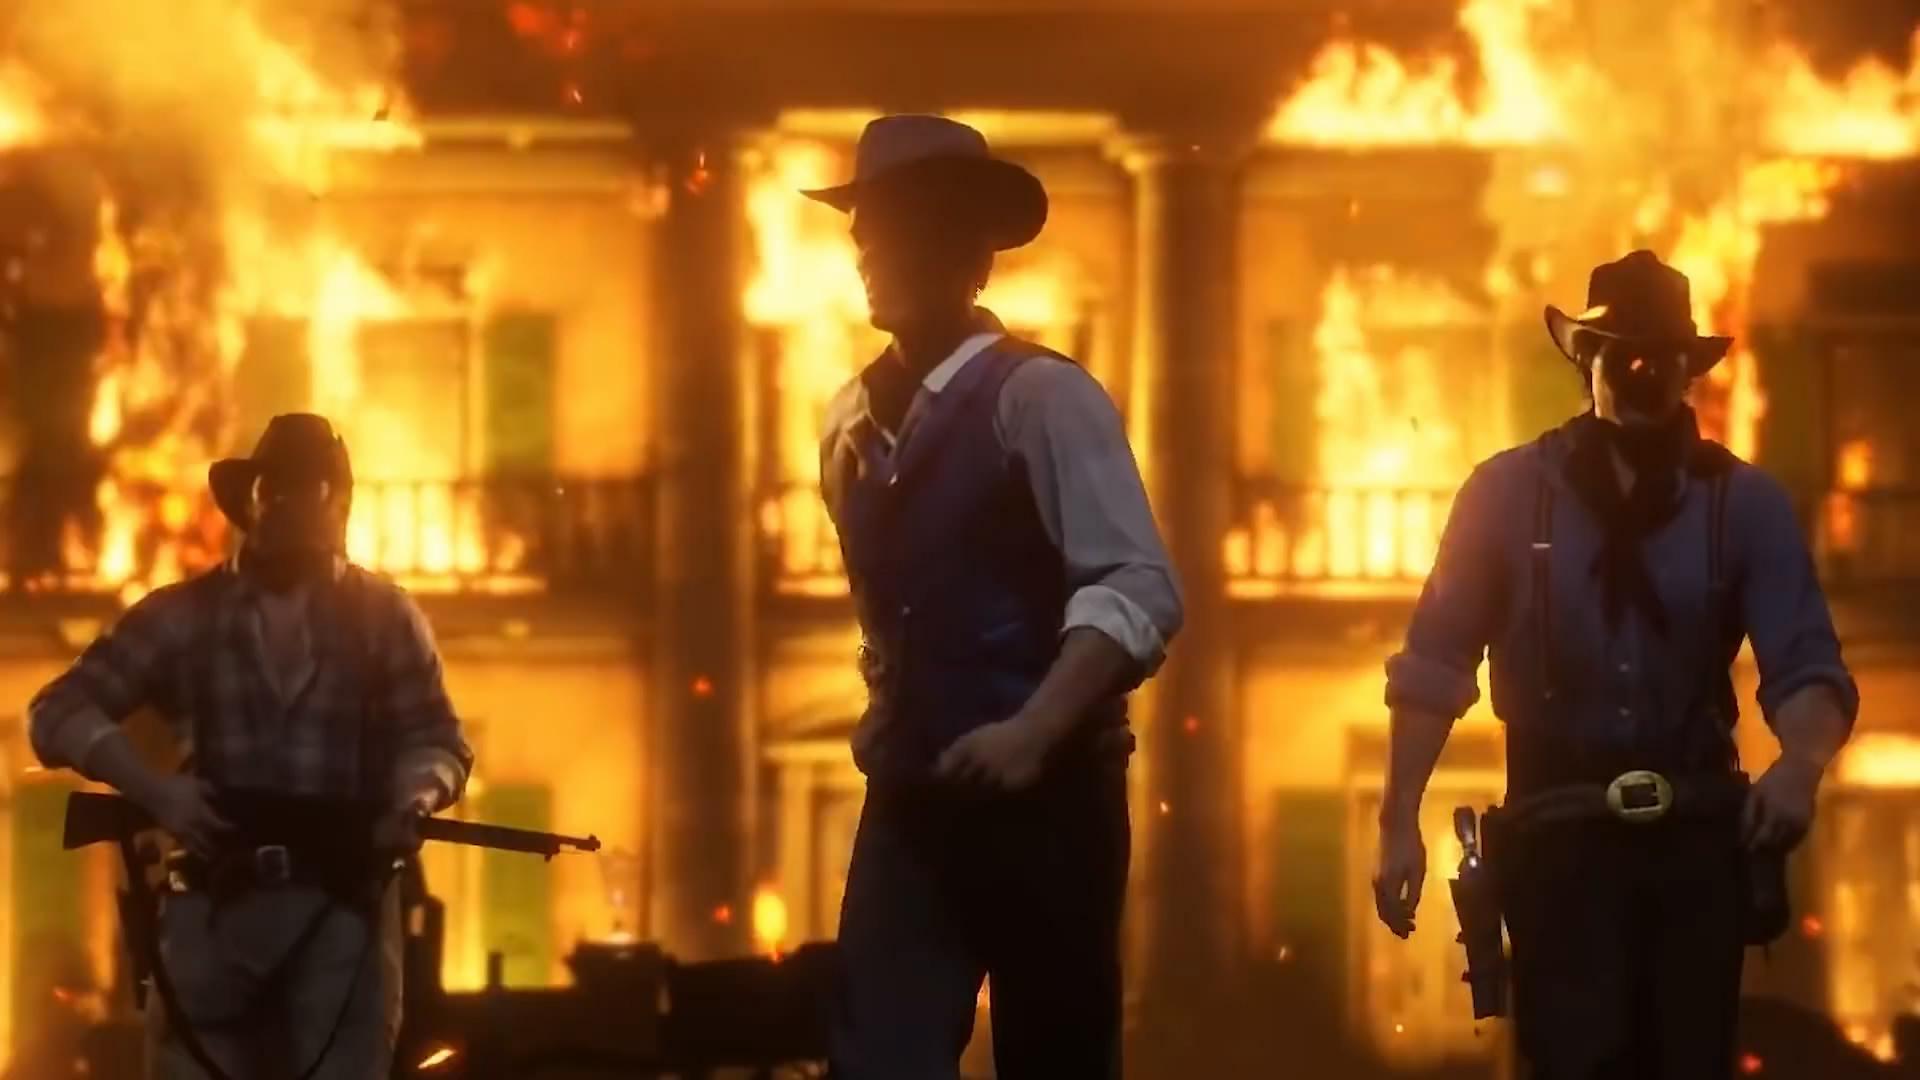 TGA 2018宣传片 《美国末日2》《大镖客2》等登场